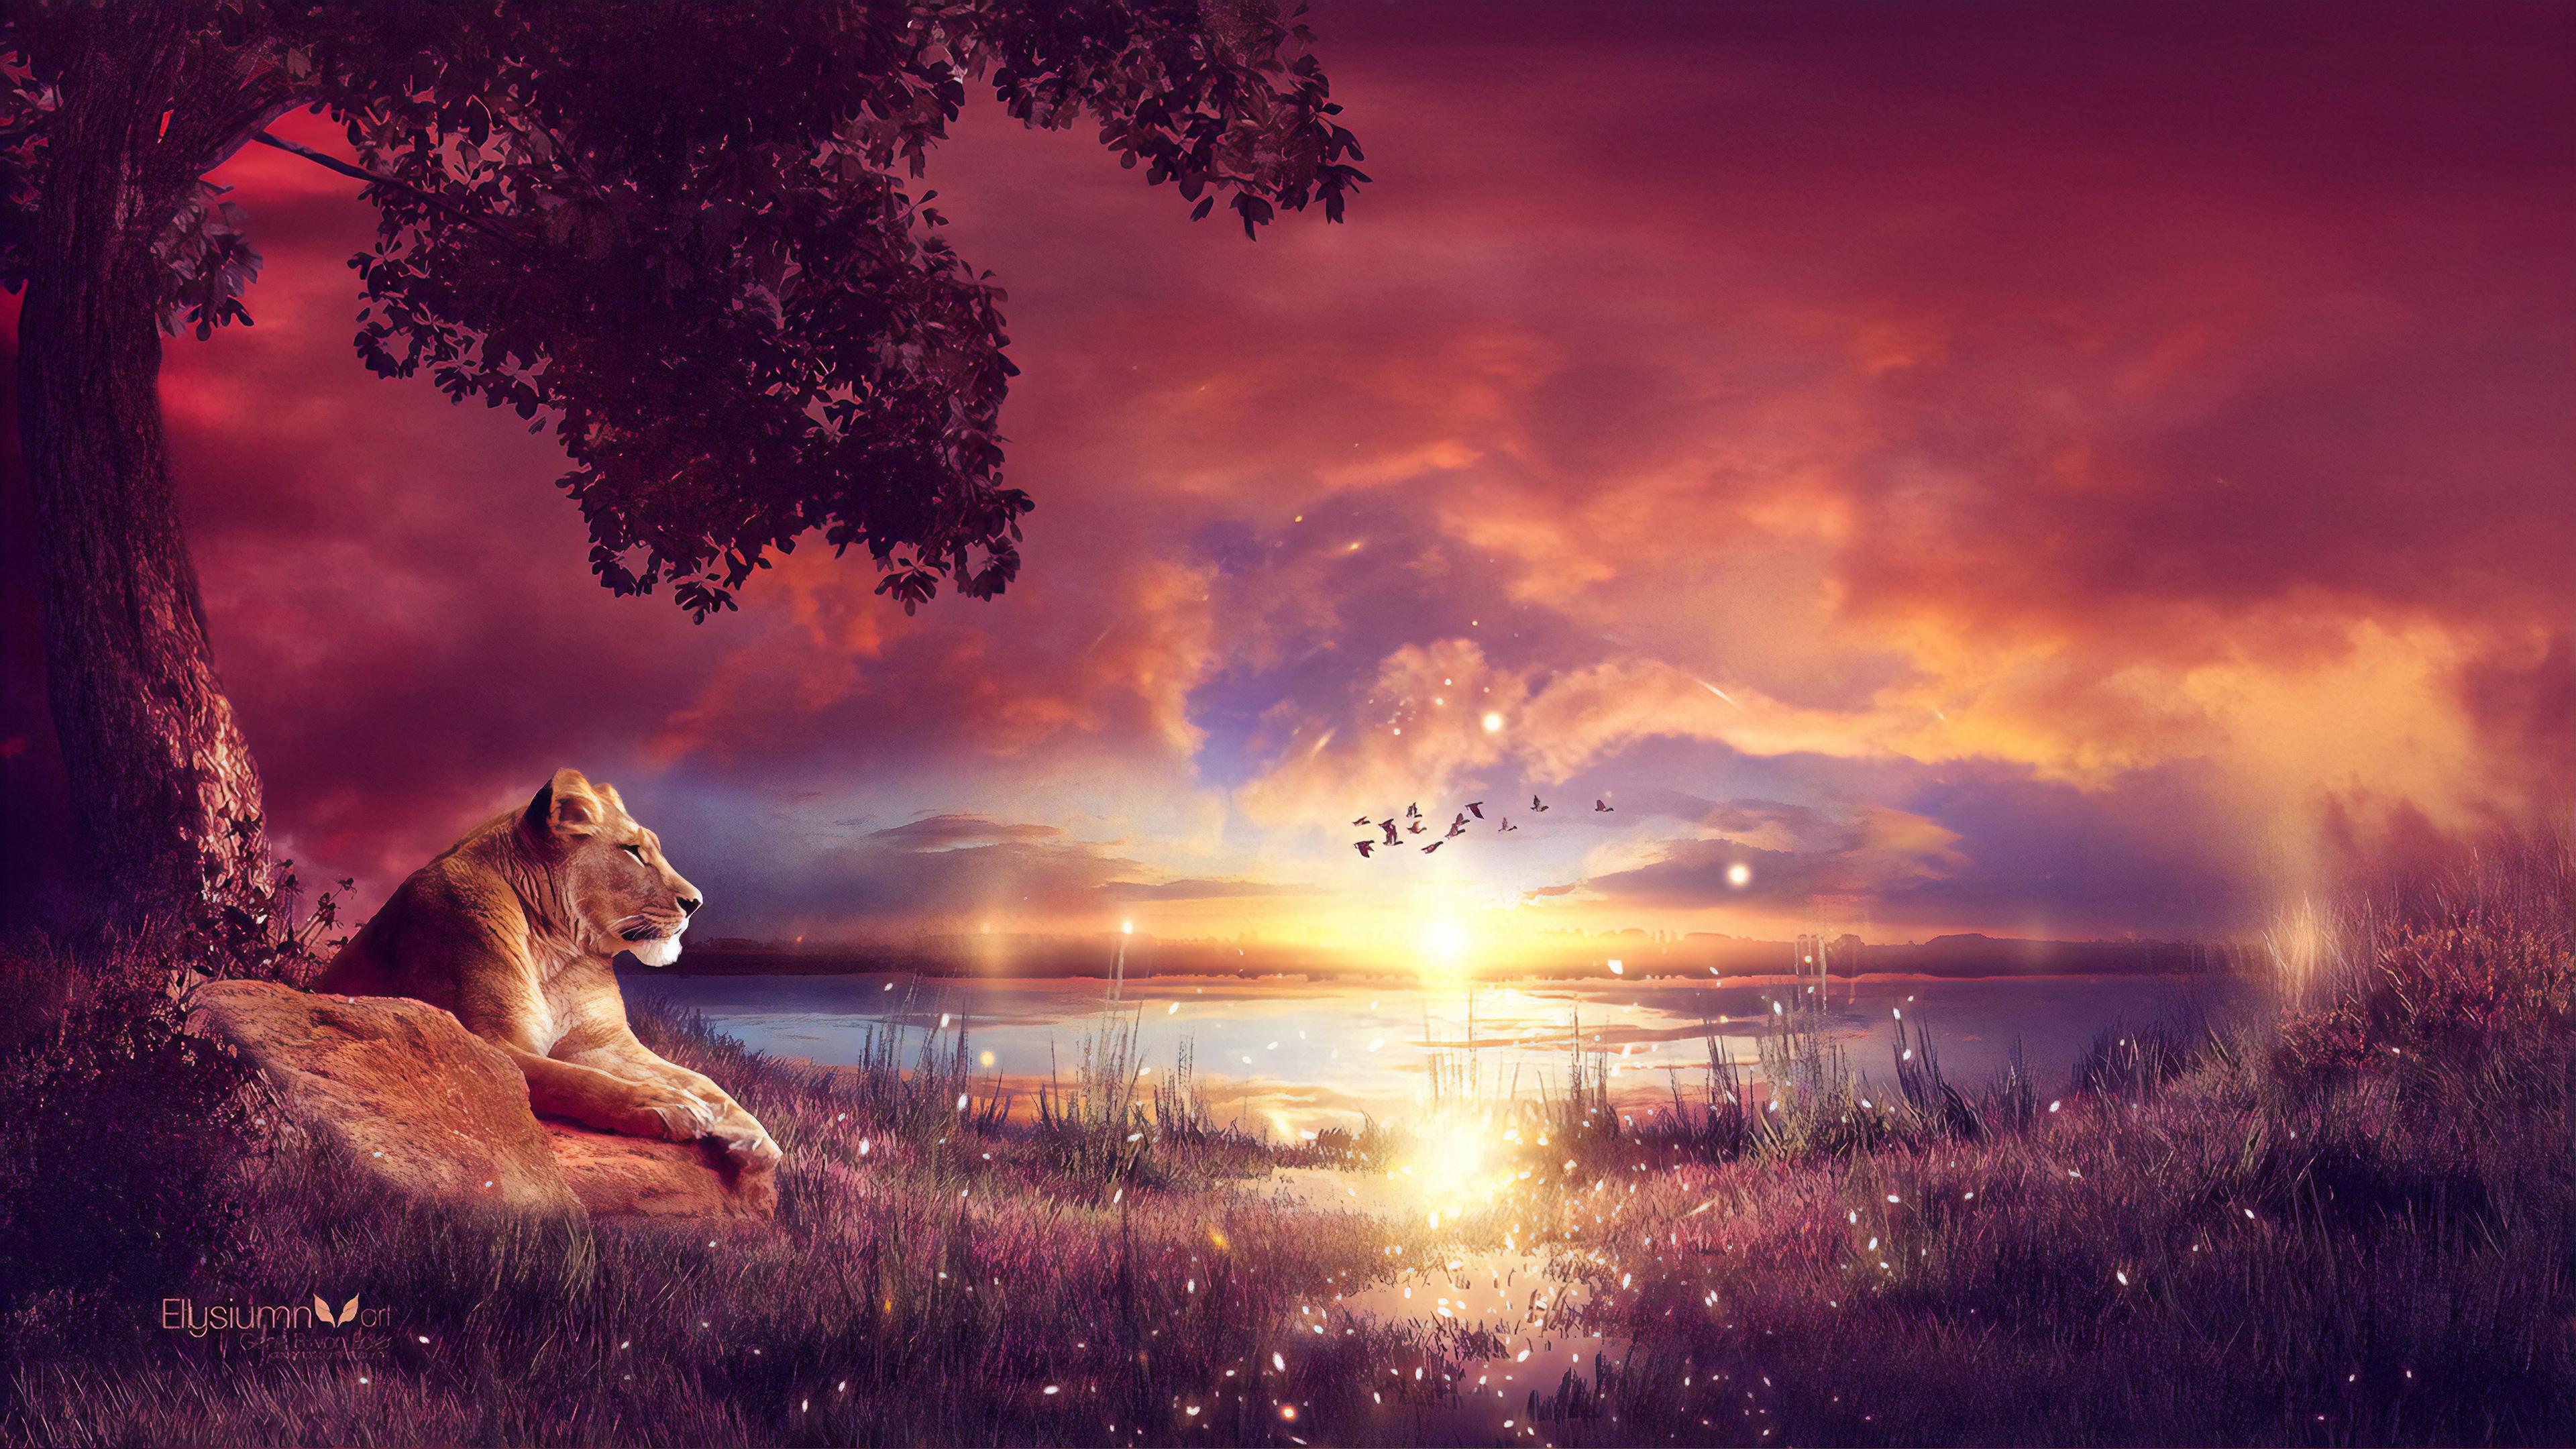 king enjoying the sunset 1574938090 - King Enjoying The Sunset -